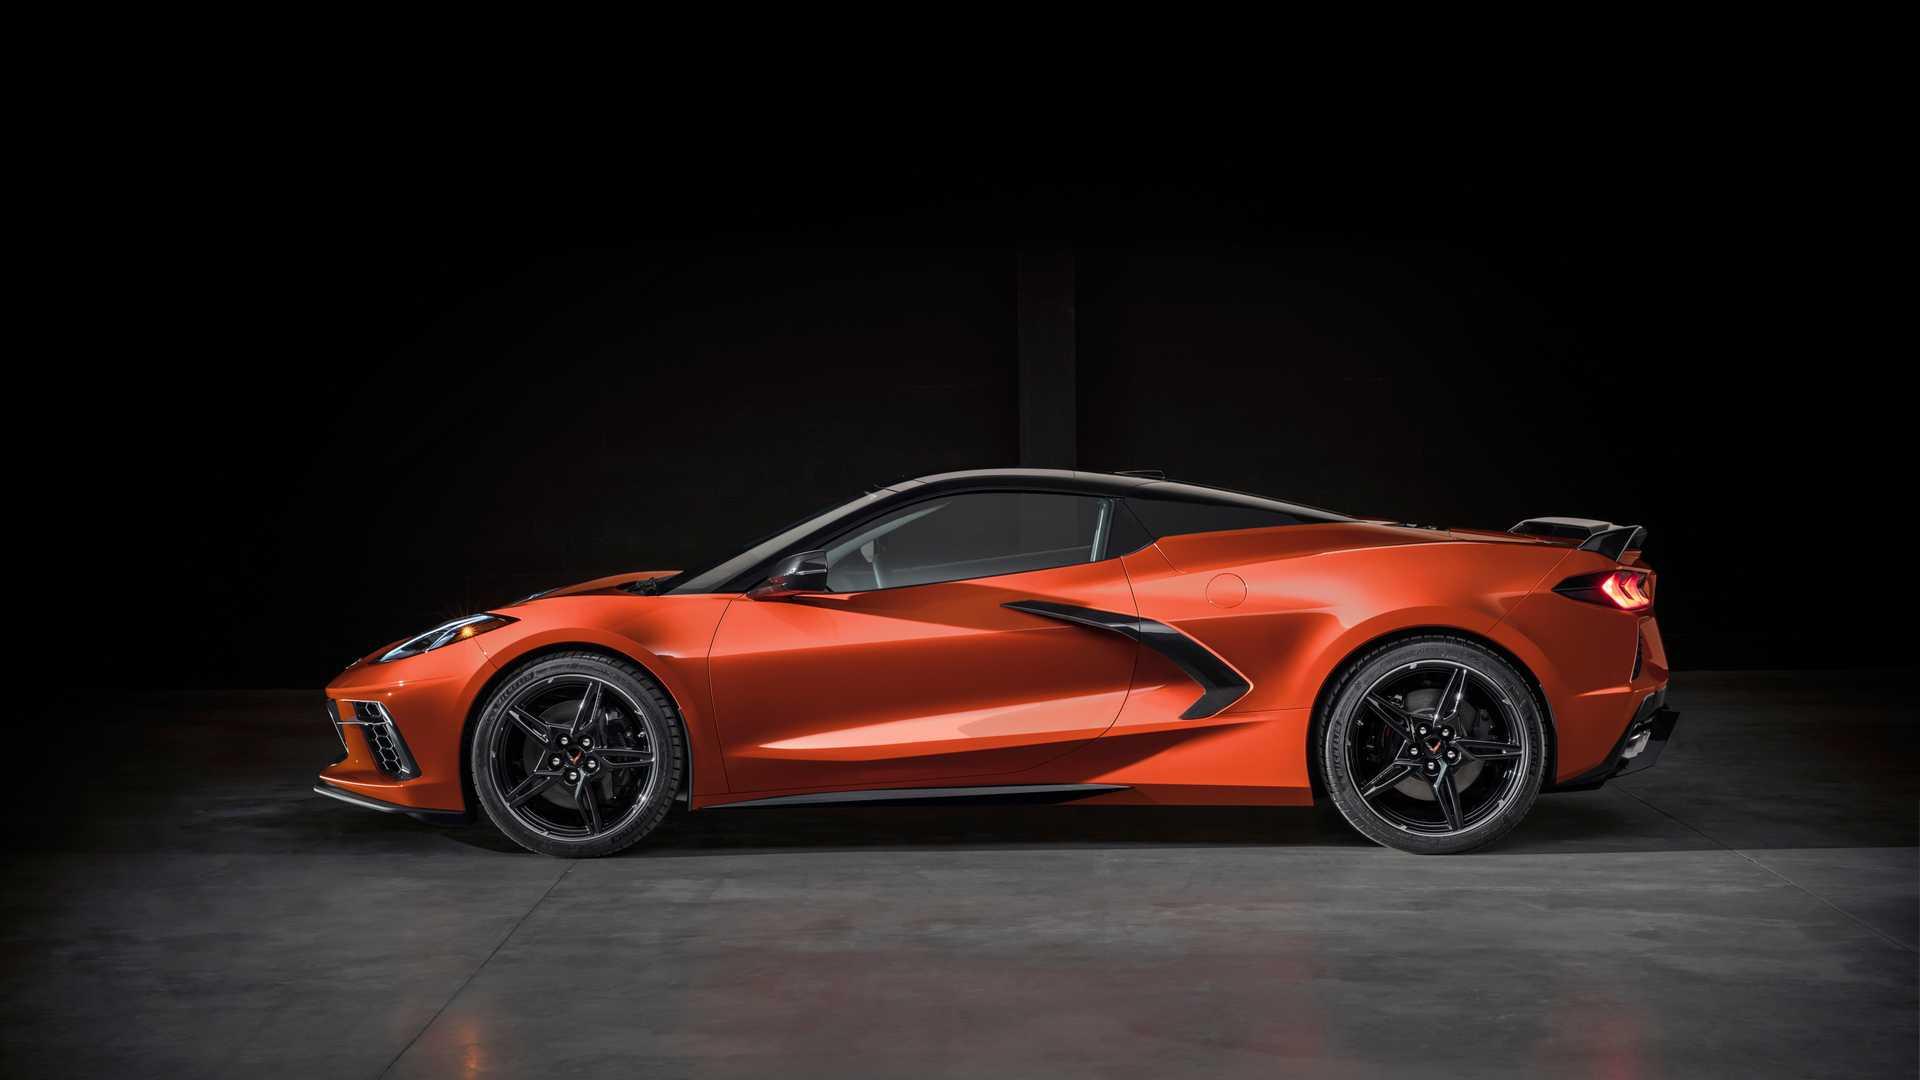 2020-chevrolet-corvette-convertible-4